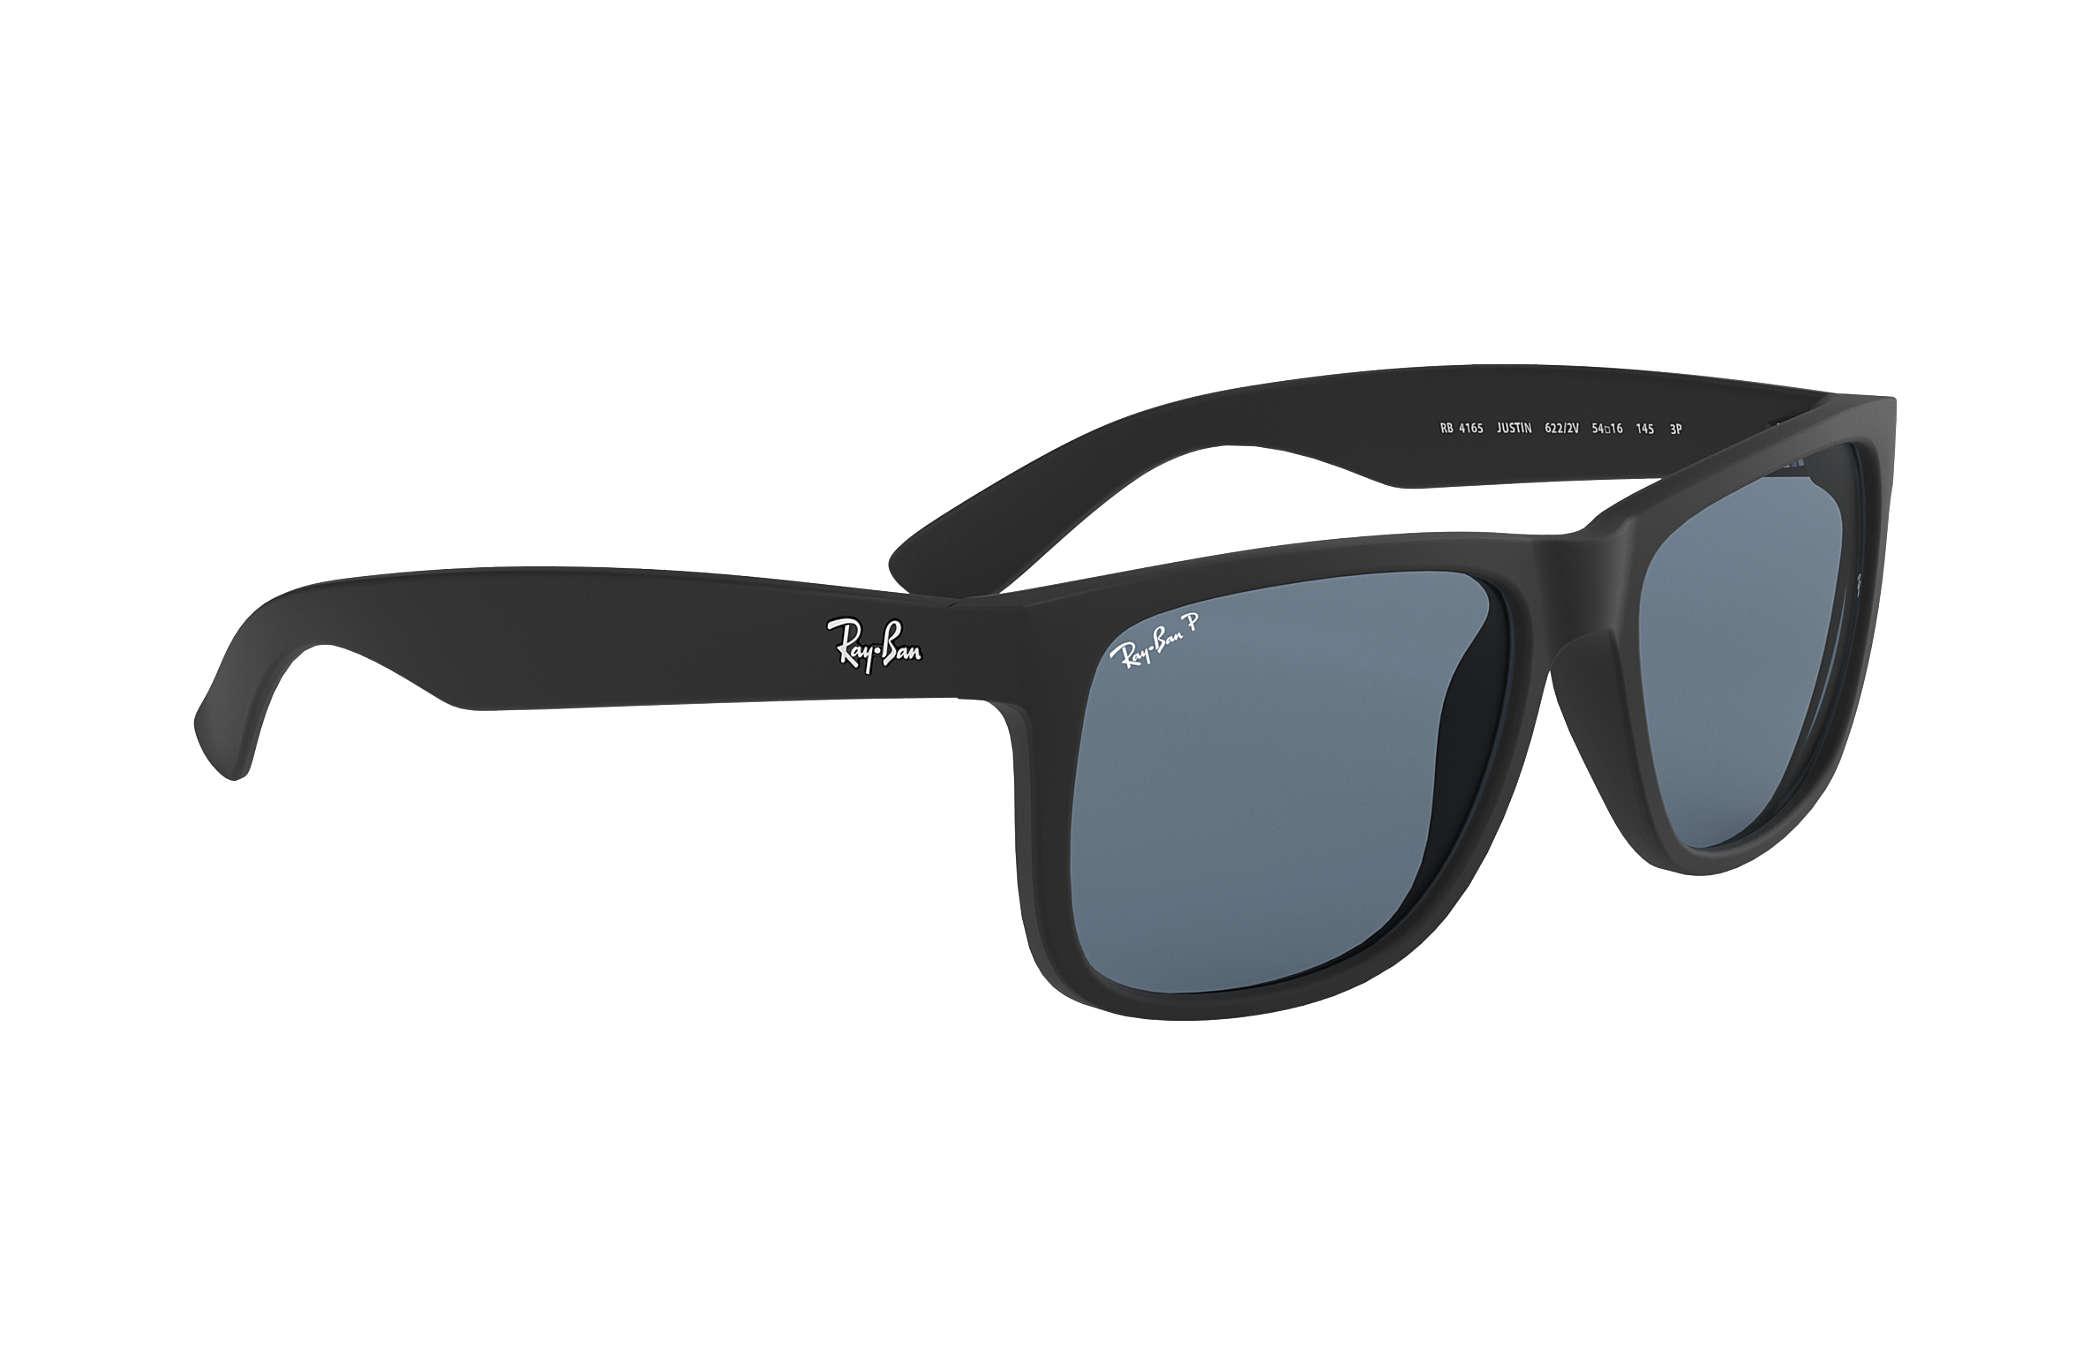 972659df66 Ray-Ban Justin Classic RB4165 Black - Nylon - Blue Polarized Lenses ...